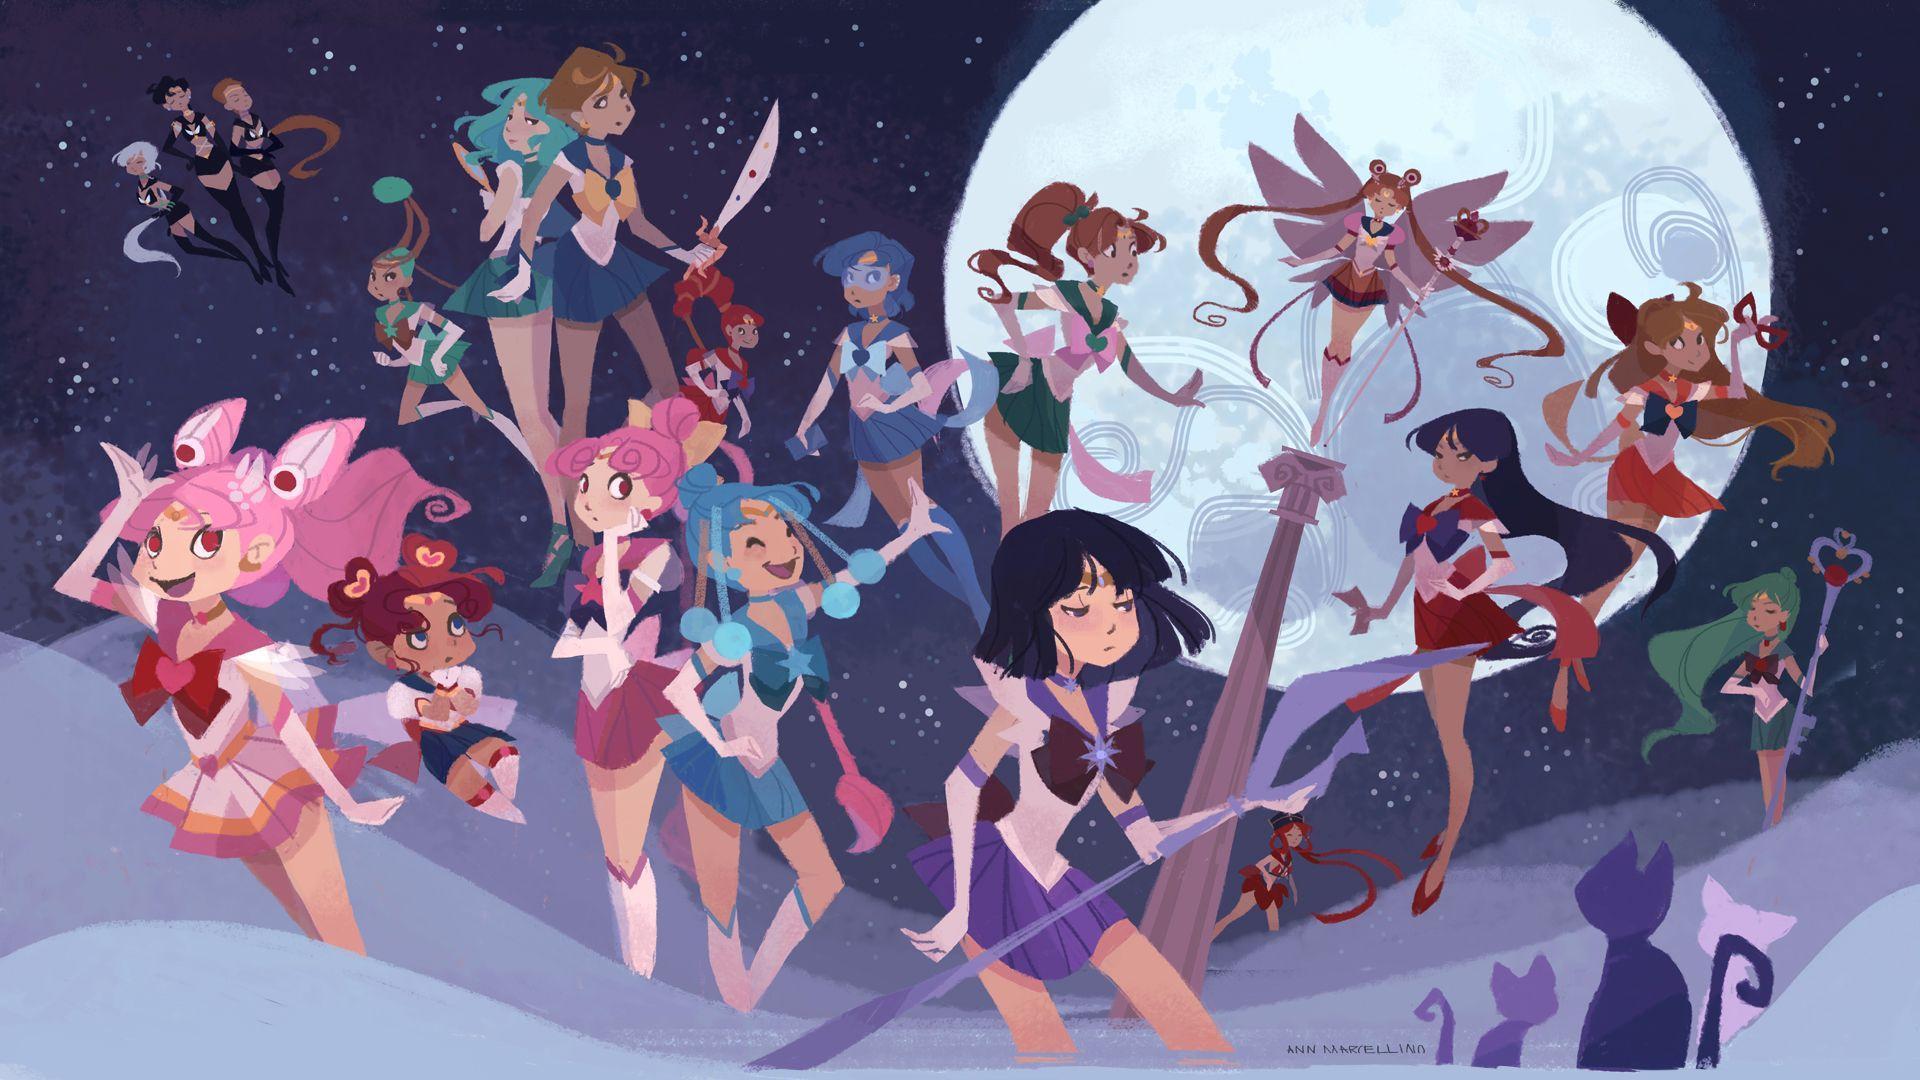 Aesthetic Sailor Moon Desktop Wallpaper Hd Anime Wallpapers